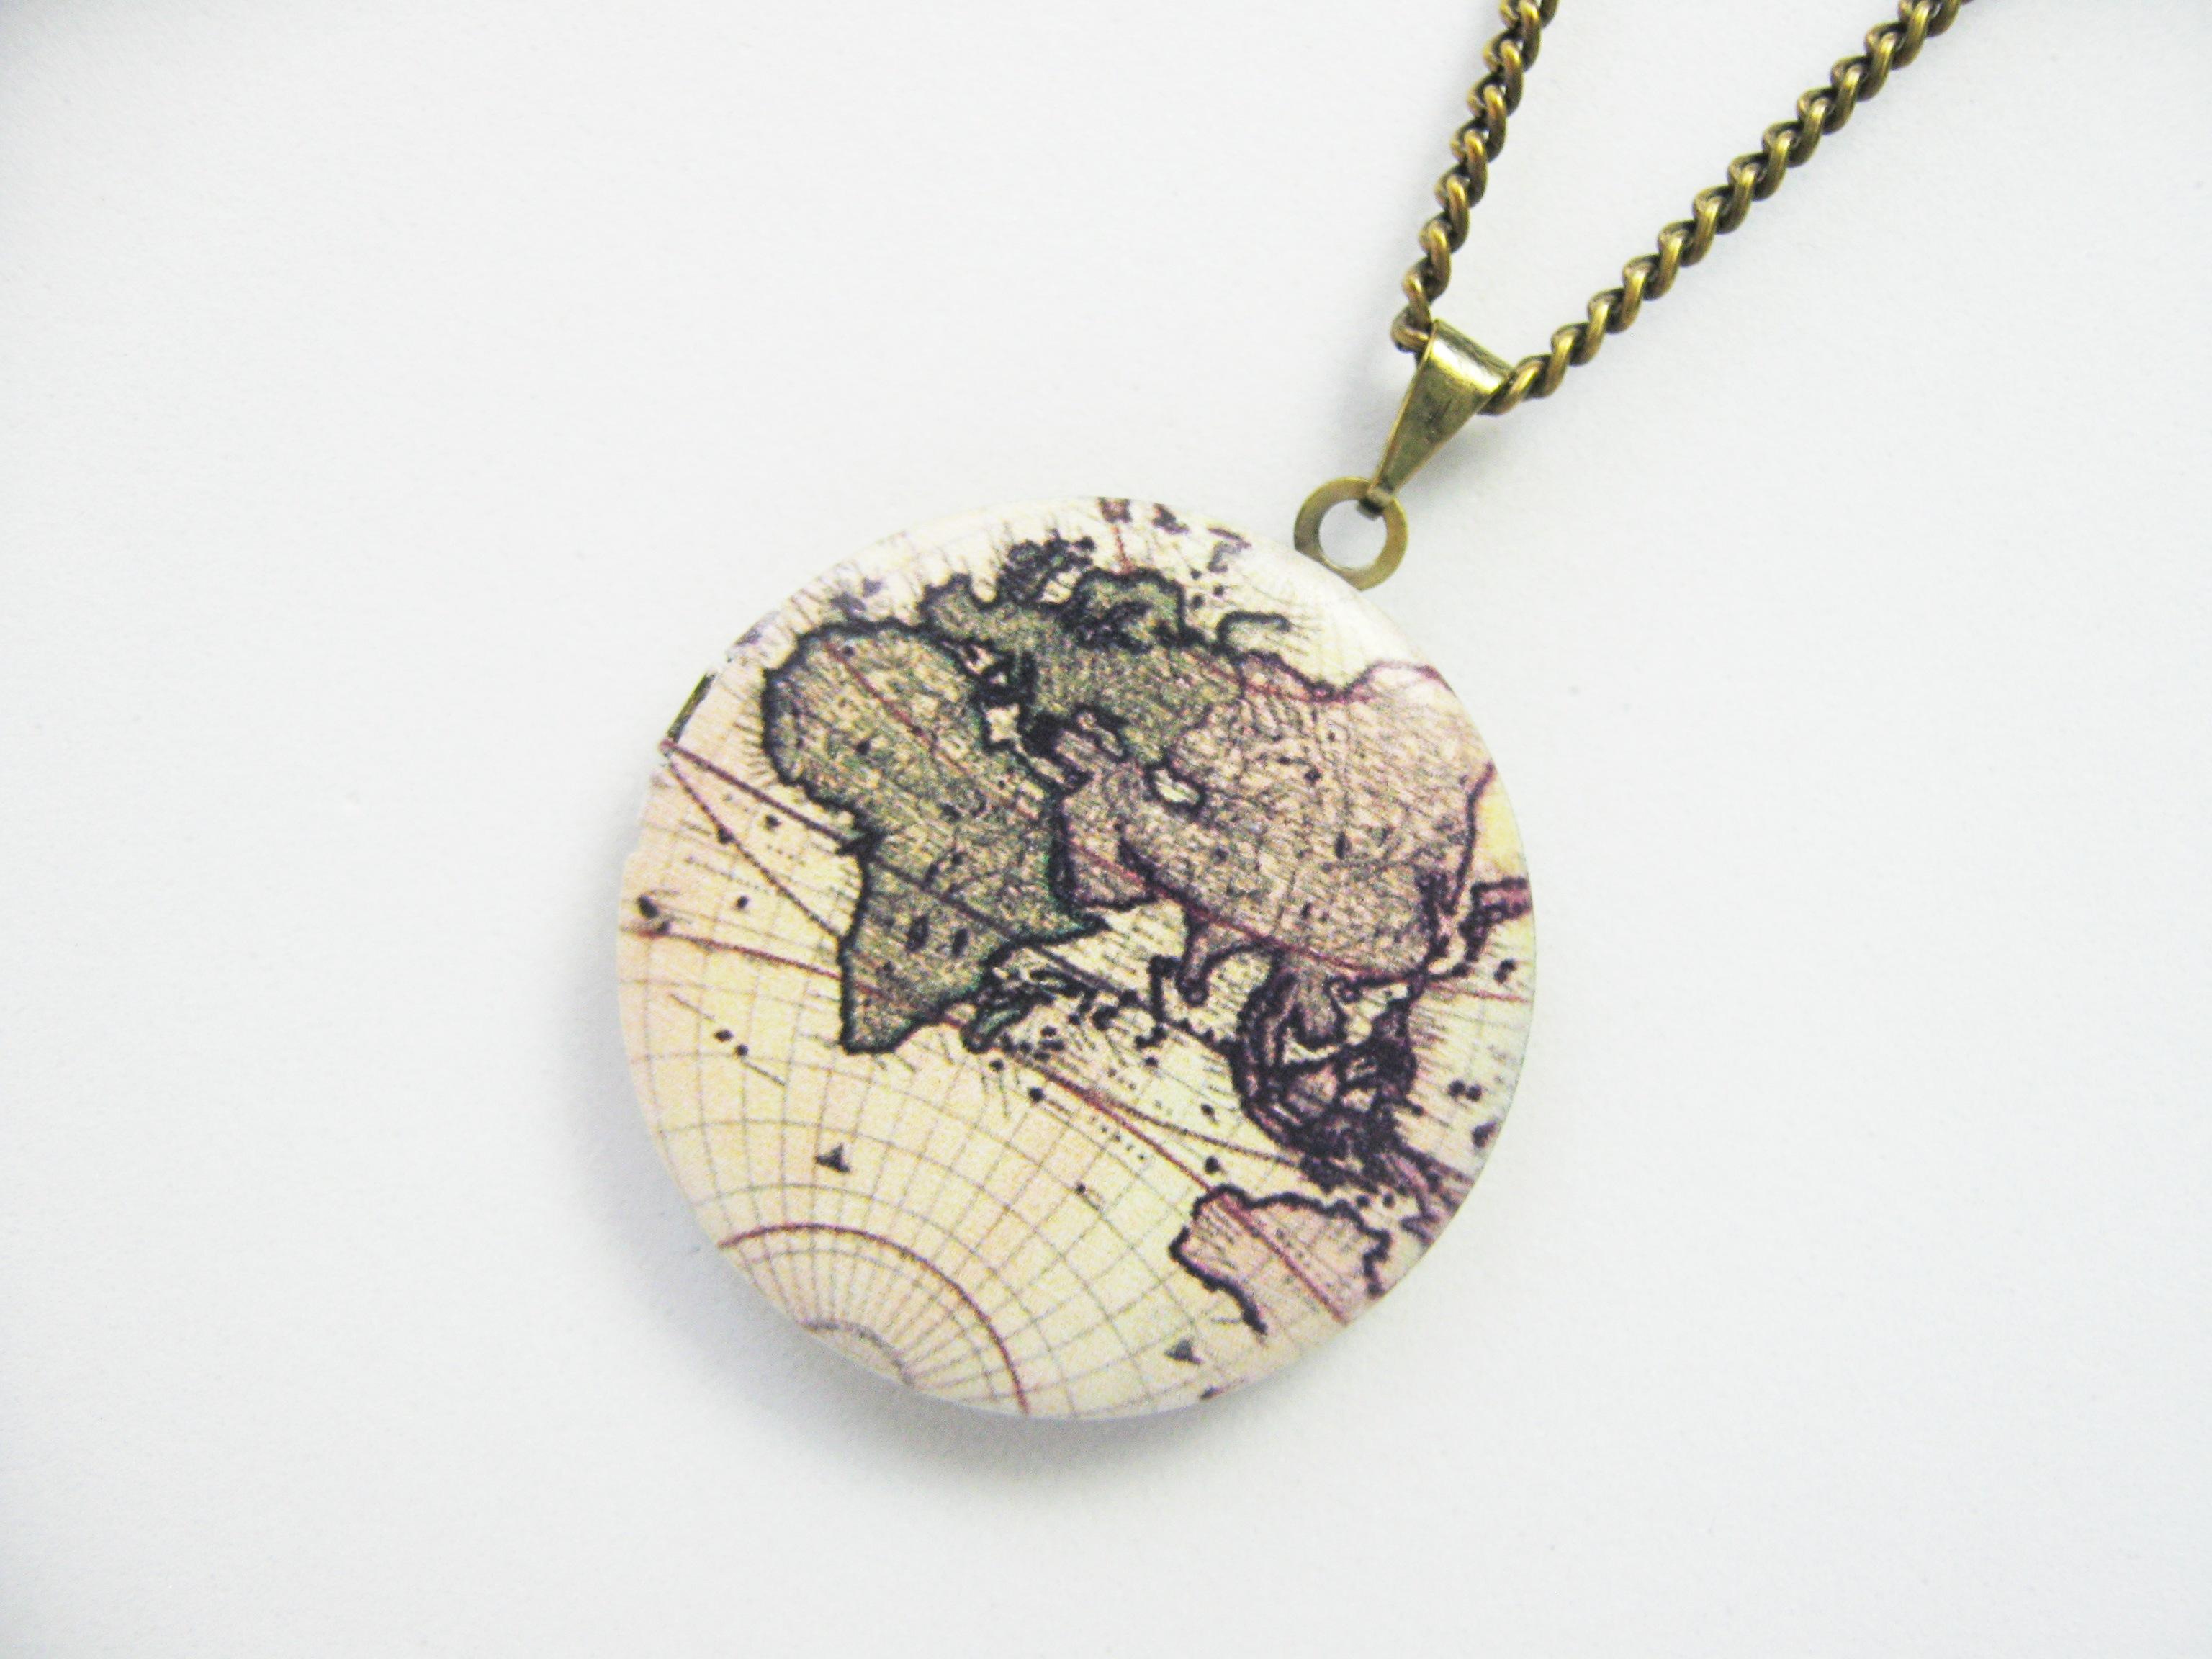 colares mapa Colar Relicário Mapa Mundi no Elo7 | Nancy Hariki (695986) colares mapa